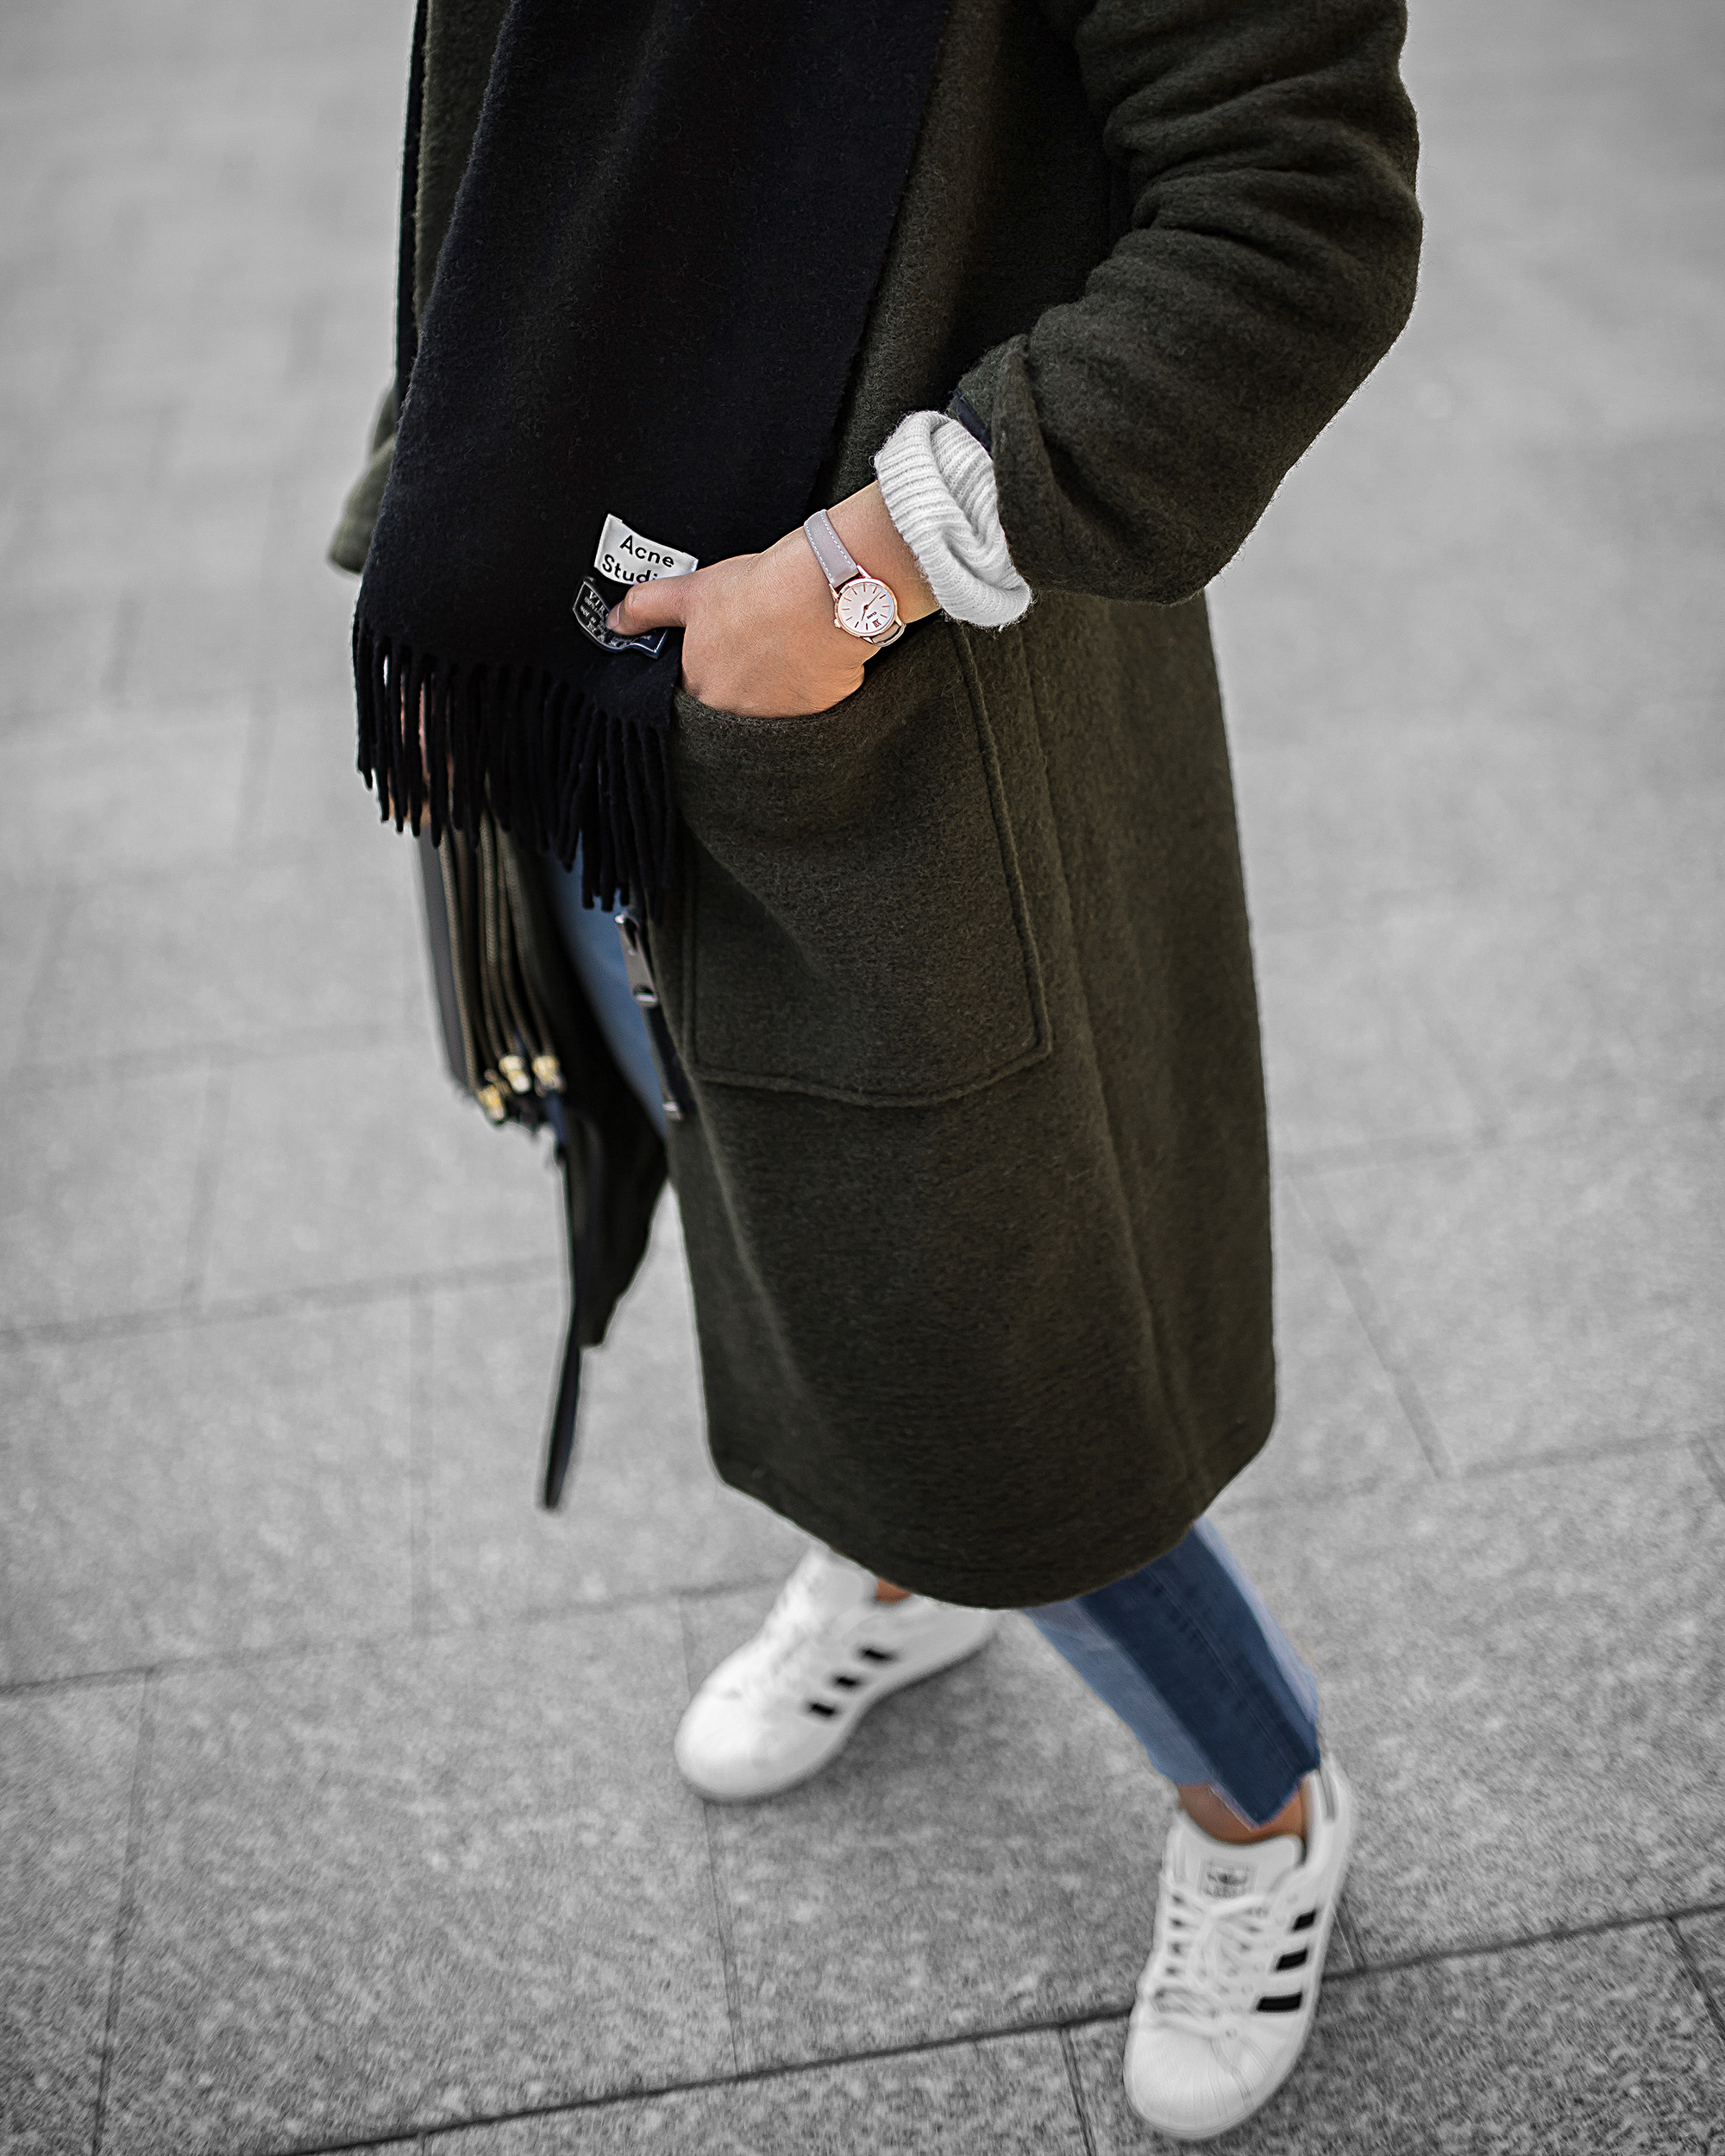 acne-scarf-khaki-coat-stepped-hem-jeans-outfit-inspiration-6-copy